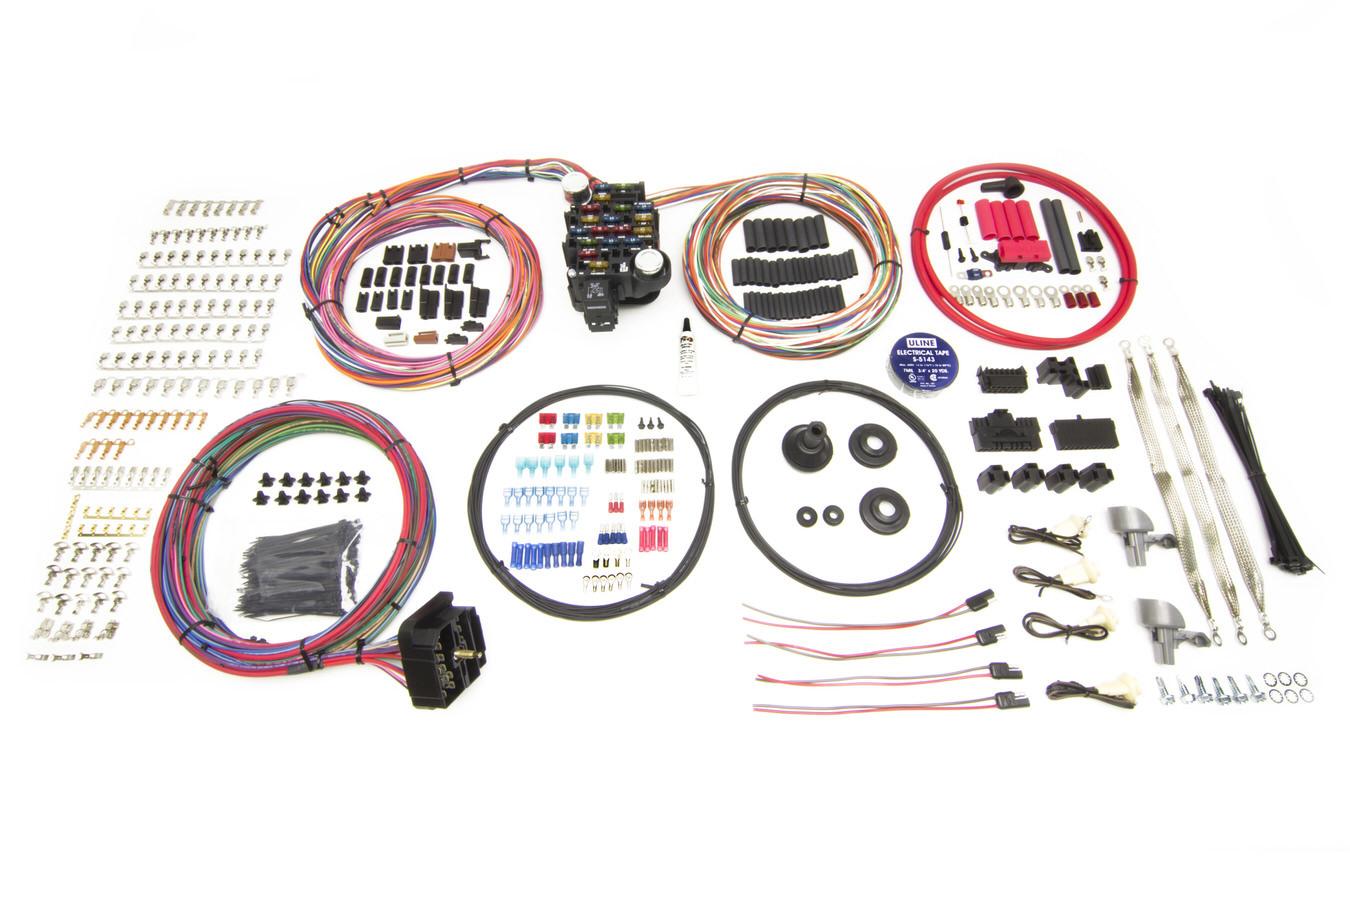 Painless Wiring 10413 Car Wiring Harness, Pro Series, Customizable, 25 Circuit, Bulkhead Firewall Pass-Through, In Column Key, GM, Kit